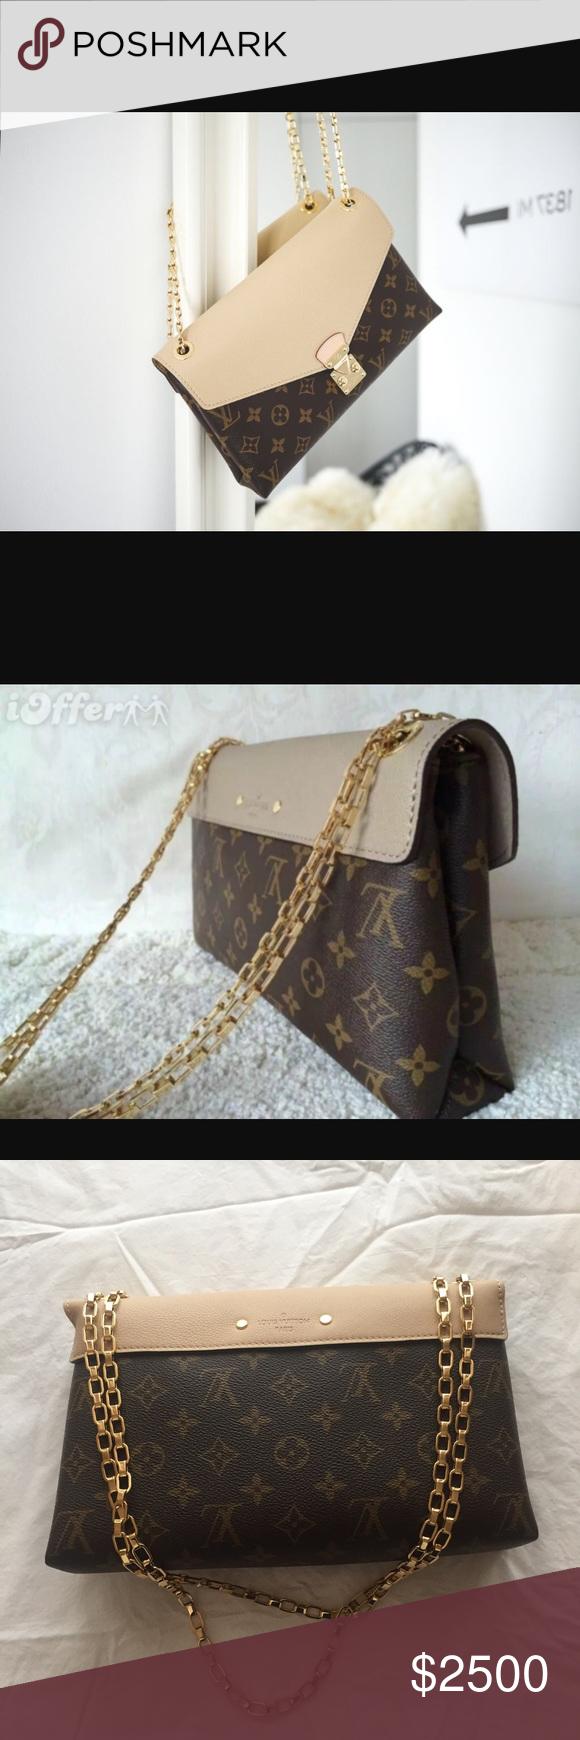 94477f1a6dc9 LOUIS VUITTON Monogram Pallas Chain Bag This brand new authentic chic  shoulder cross body bag